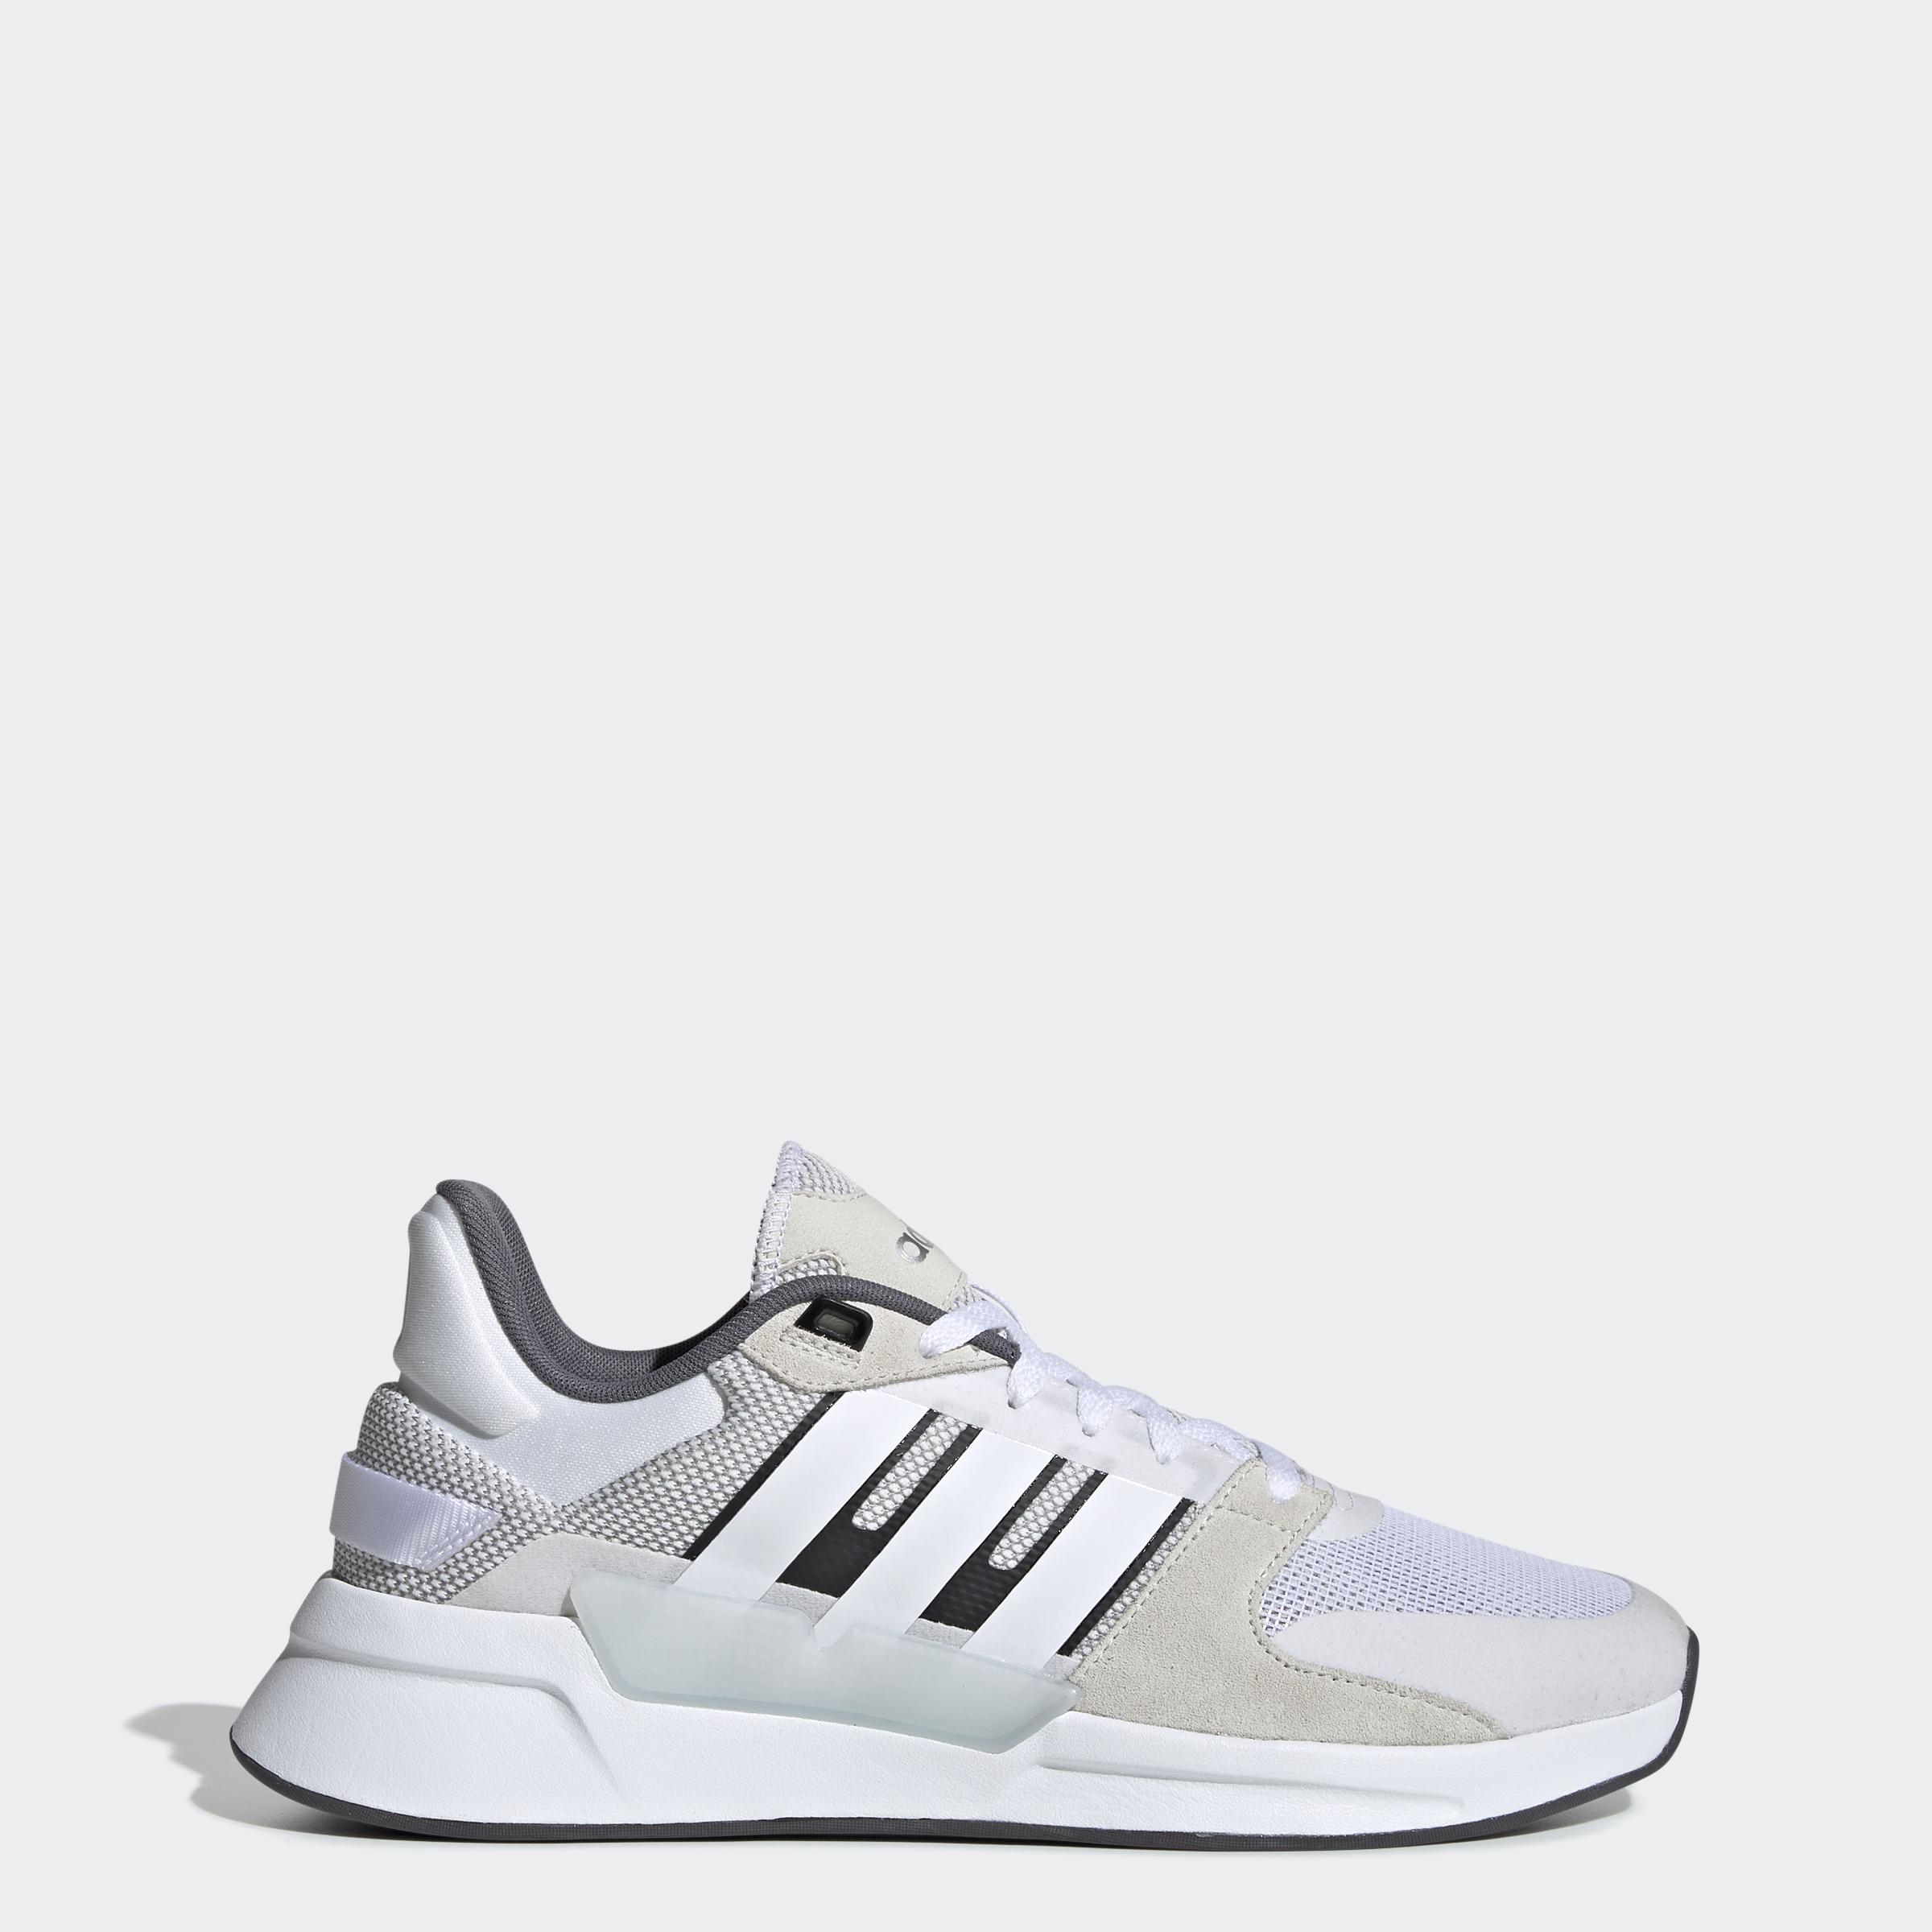 adidas-Run-90s-Shoes-Men-039-s thumbnail 10